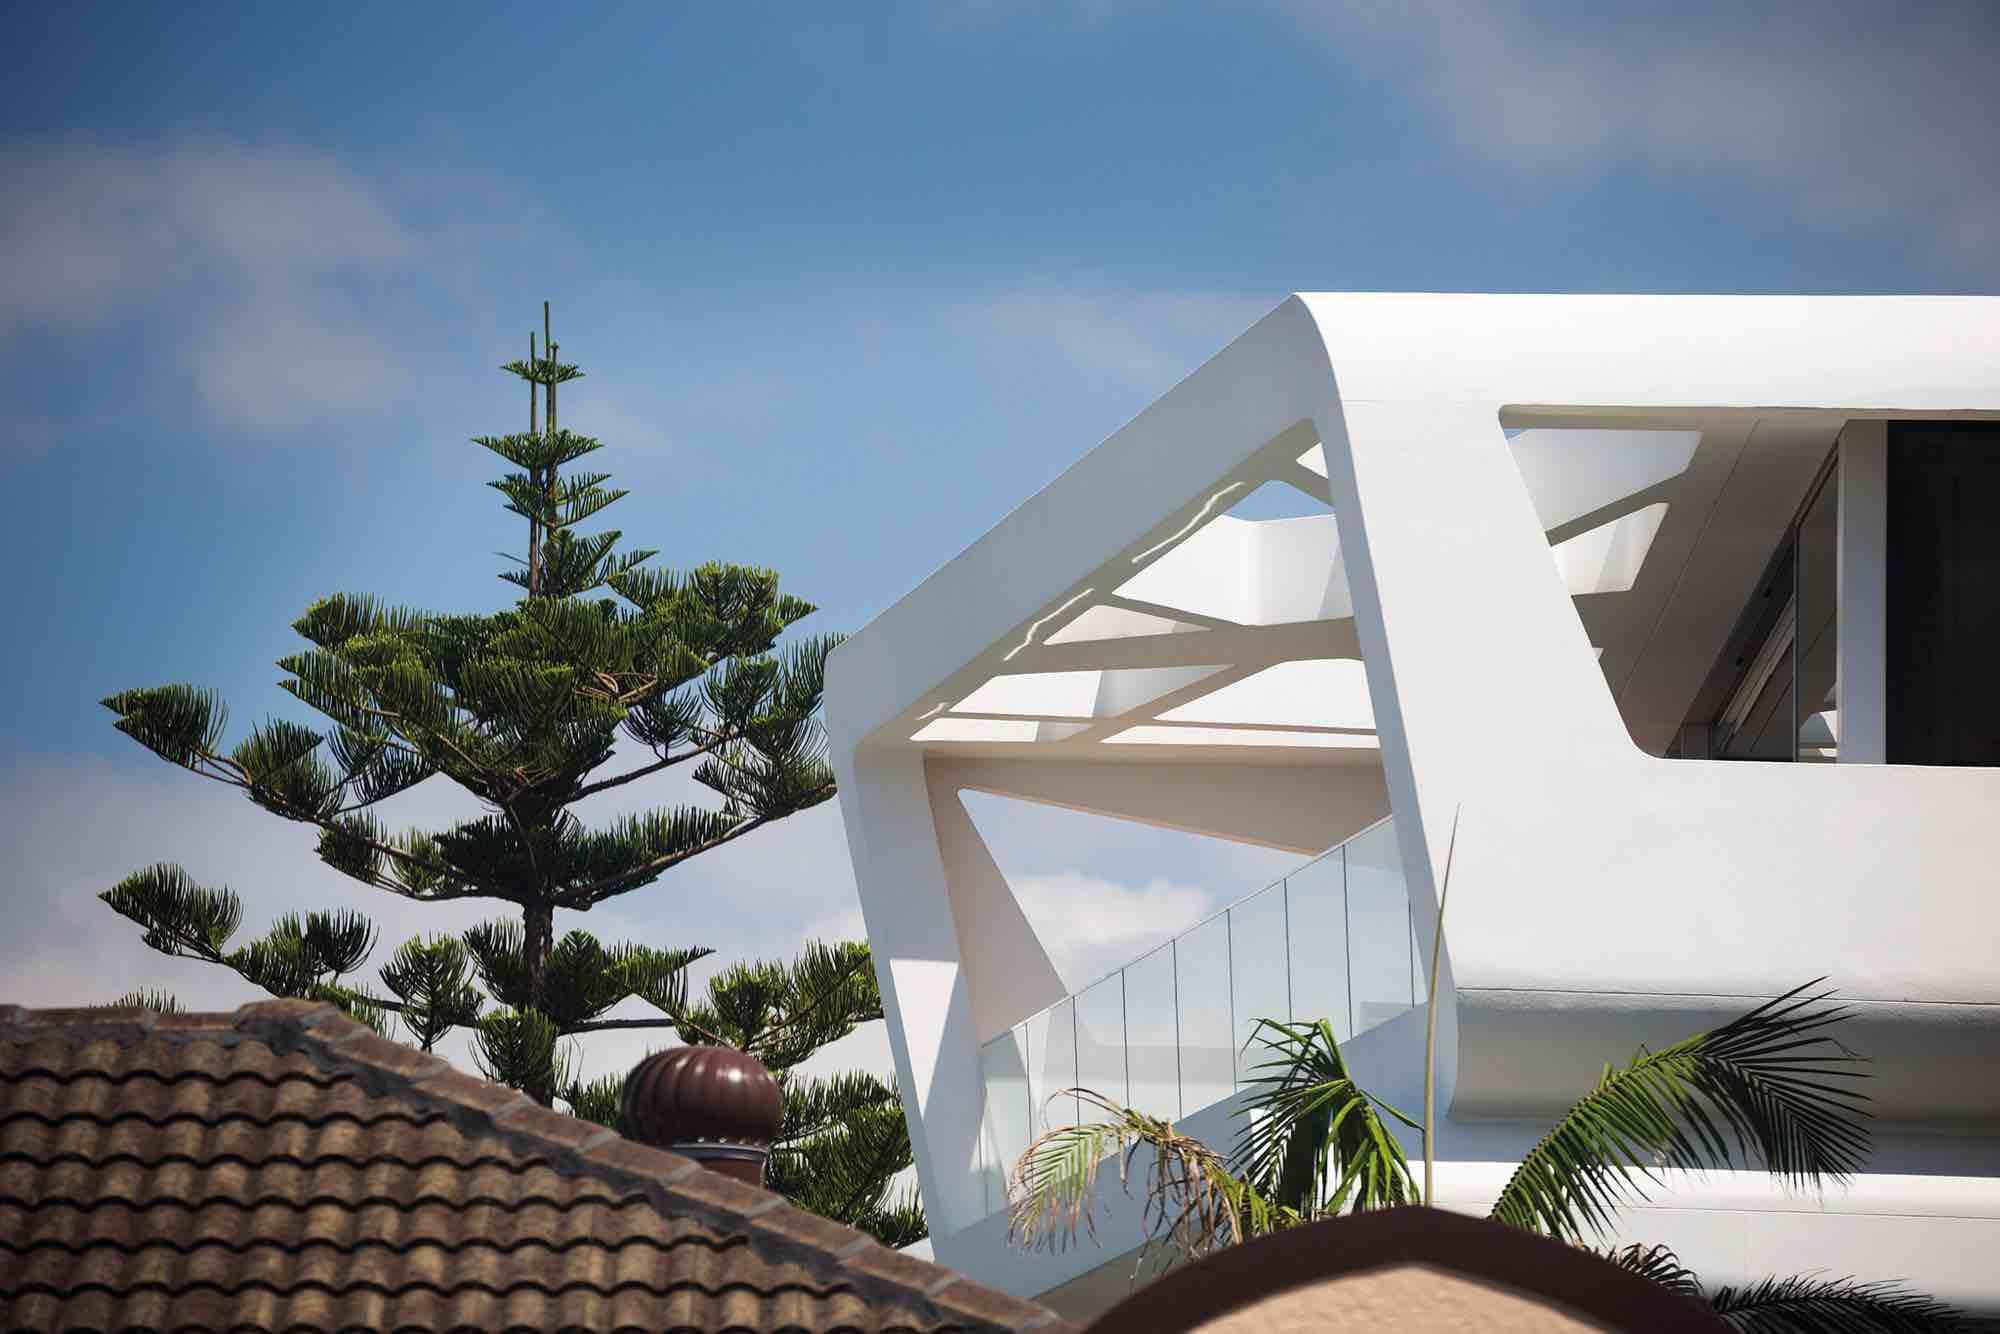 hewlett-street-house-mpr-design-group_hewlett_house23